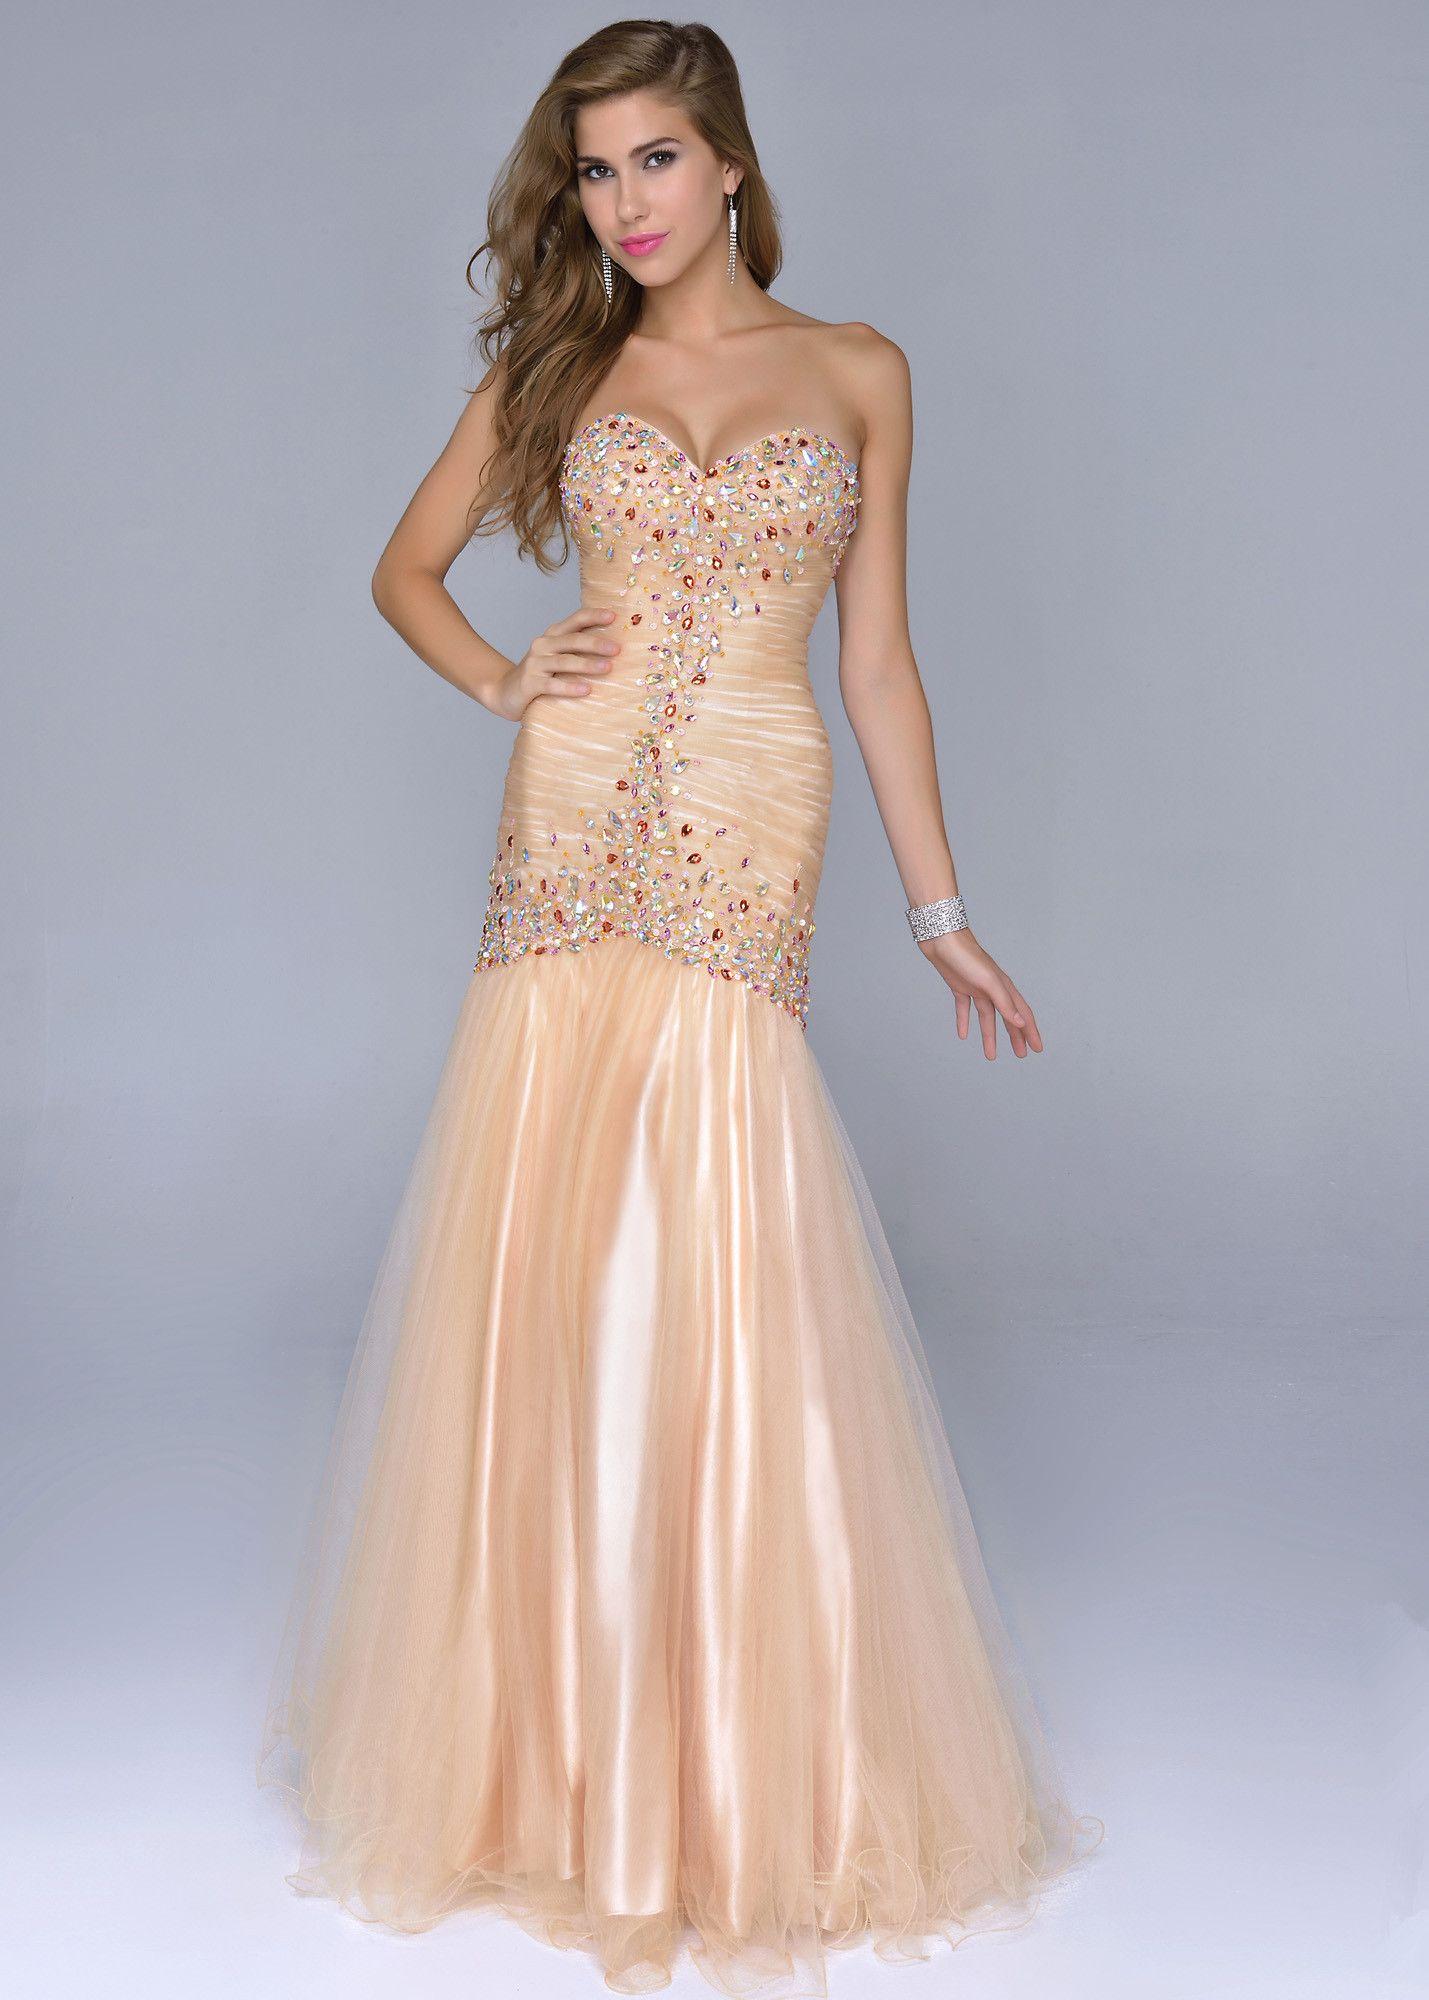 Gold Beaded Cheap Mermaid Style Prom Dresses   Dresses ...